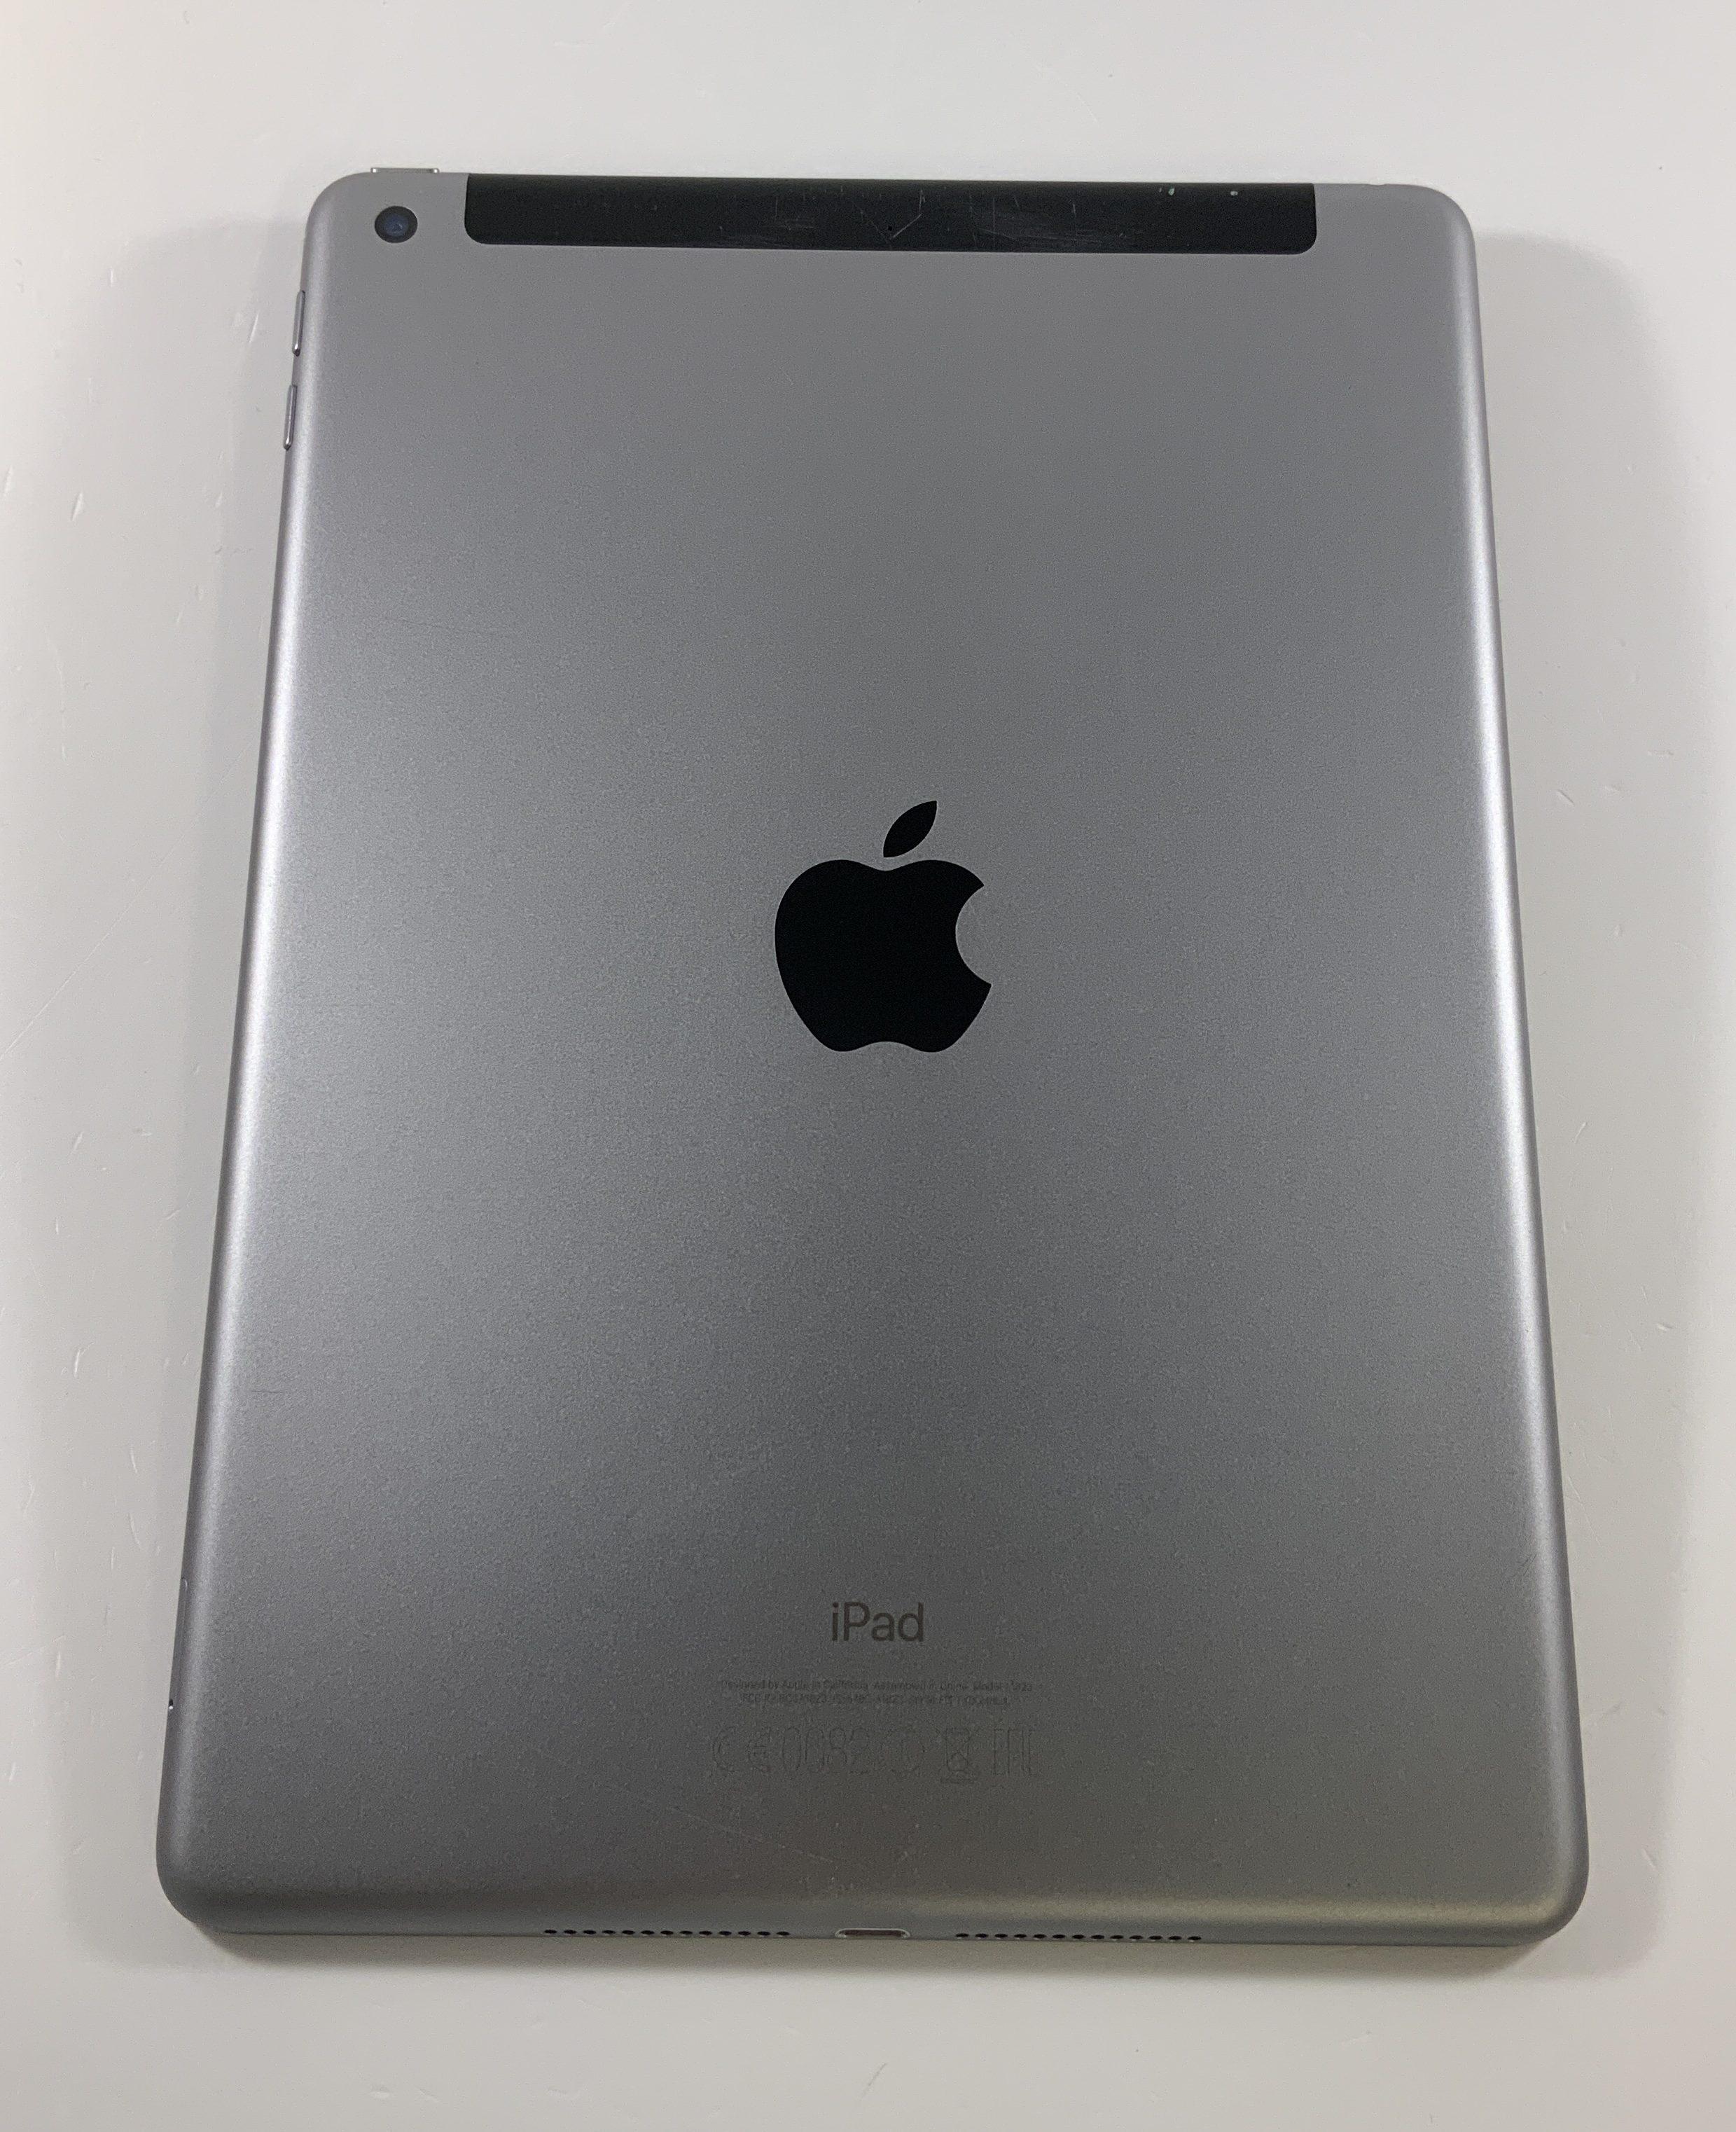 iPad 5 Wi-Fi + Cellular 128GB, 128GB, Space Gray, immagine 2